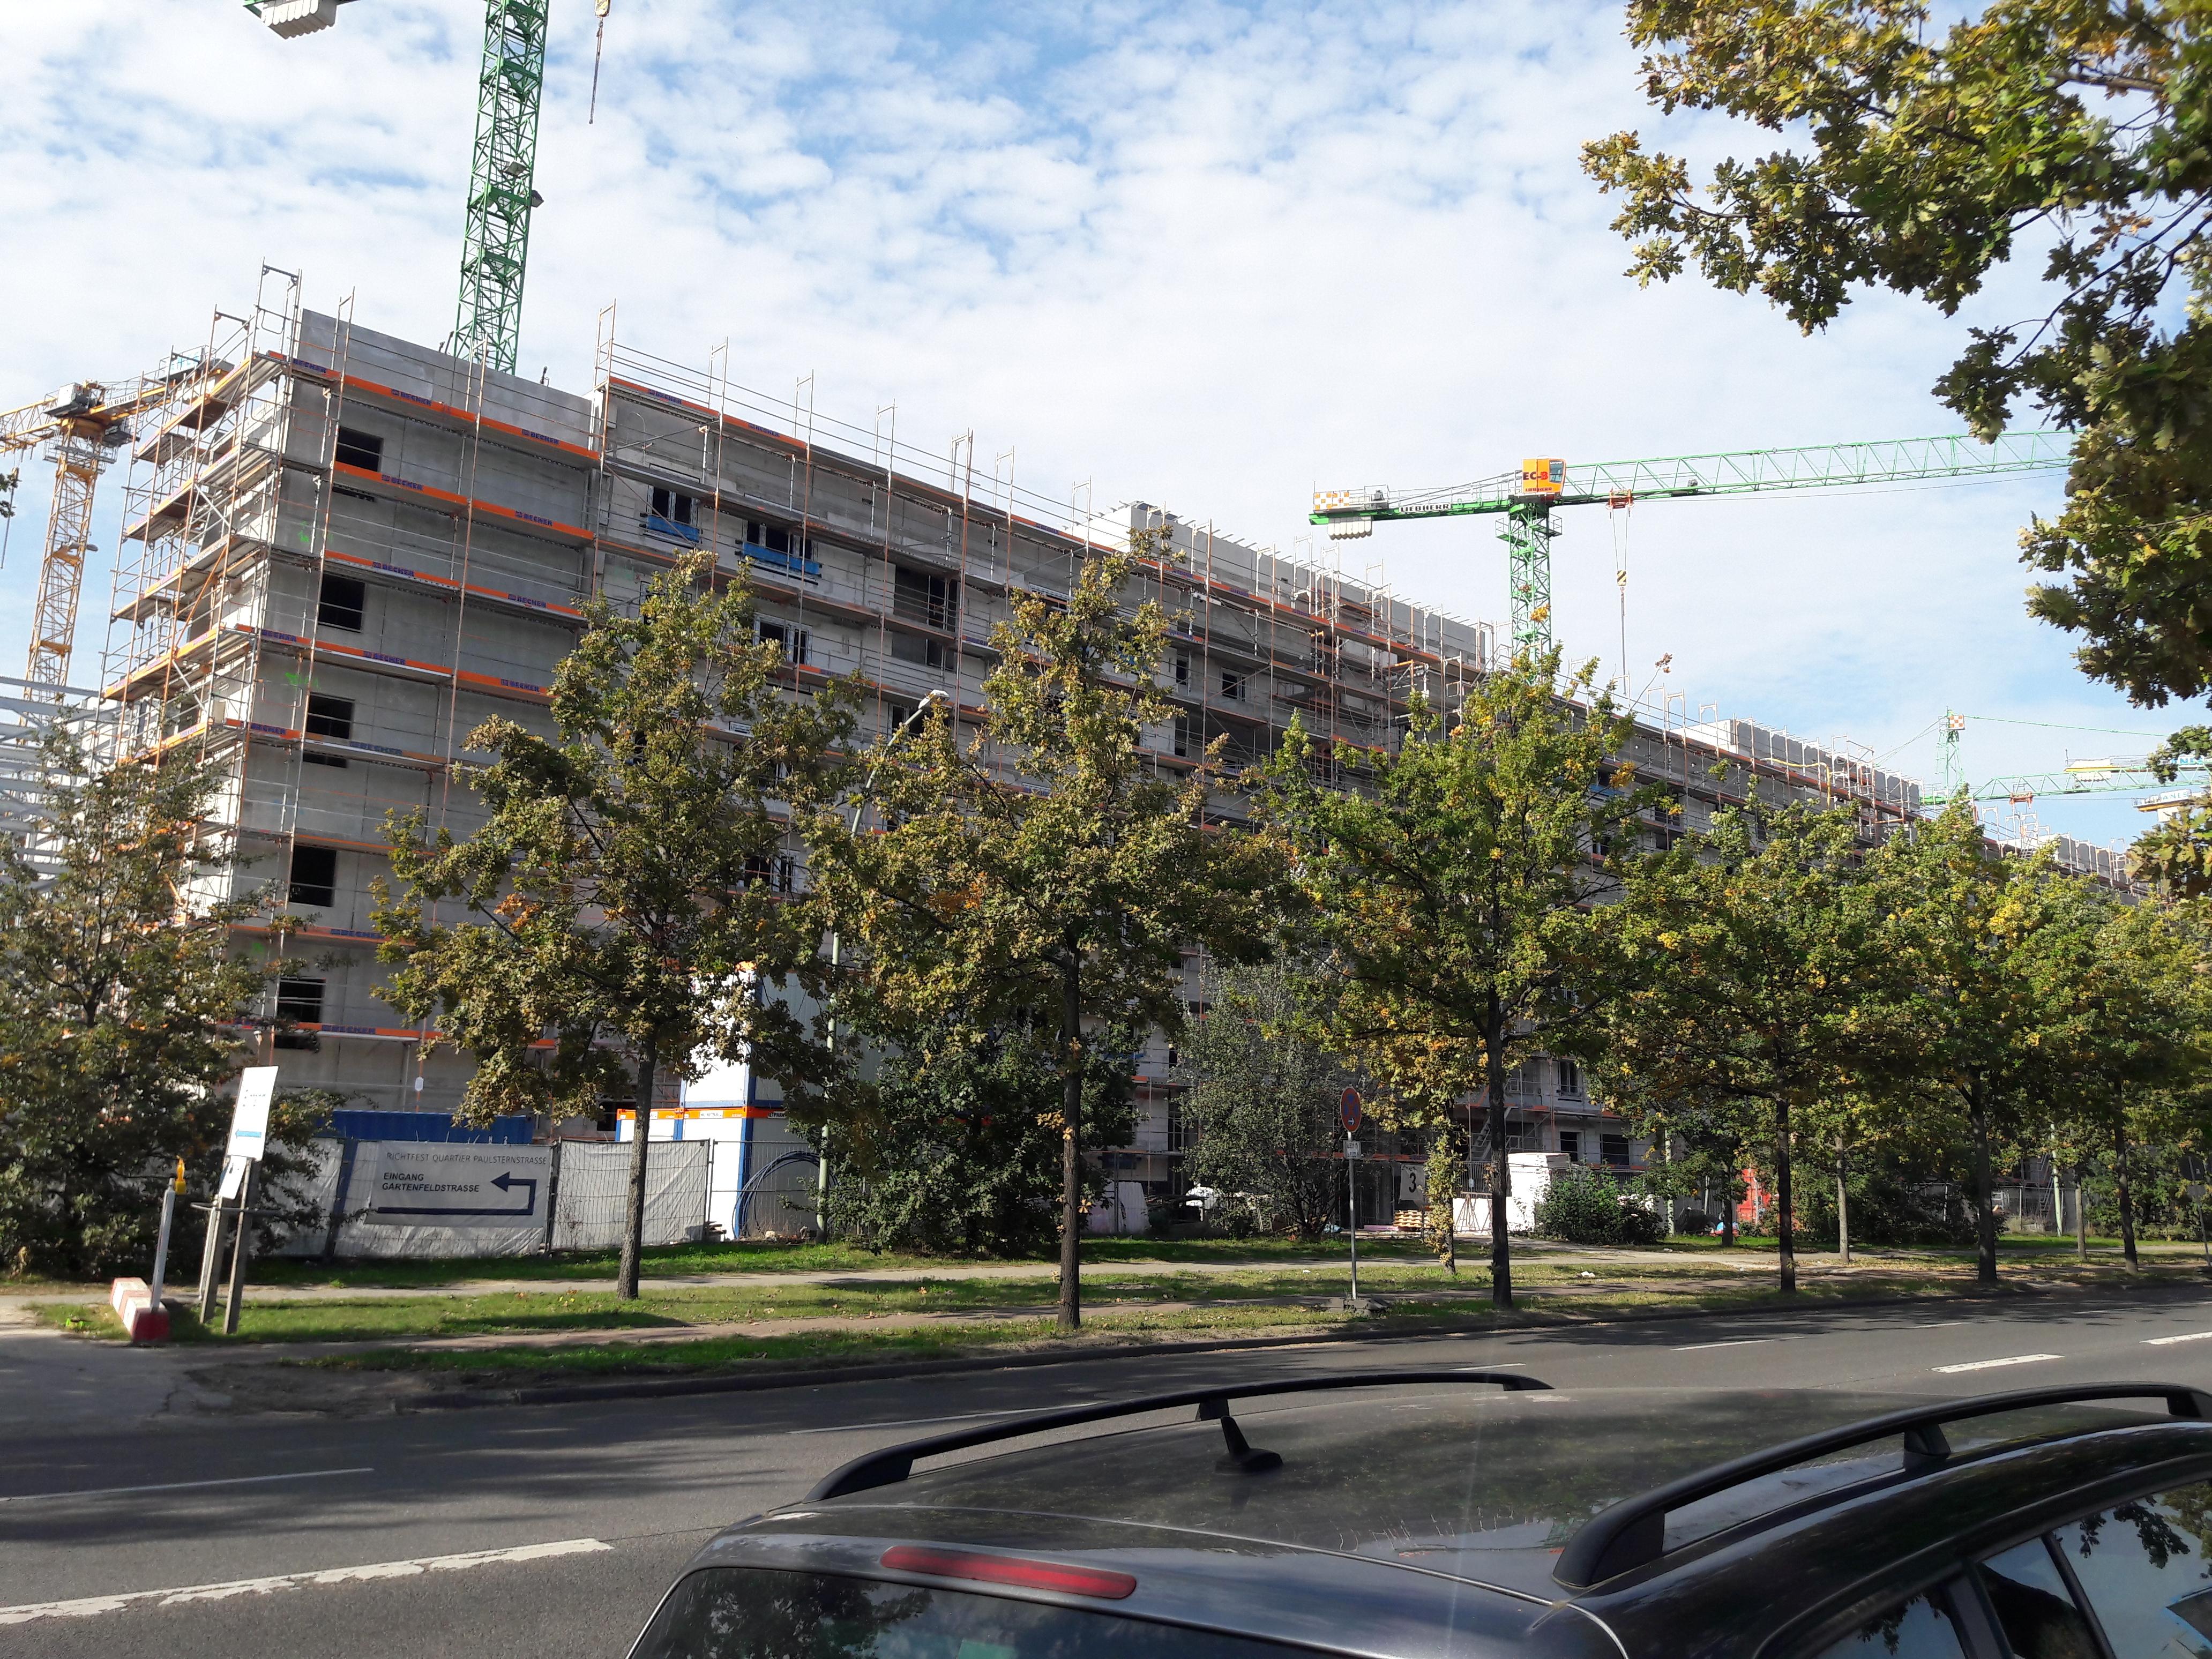 Kolonie-Paulstern-Neubauprojekt.jpg